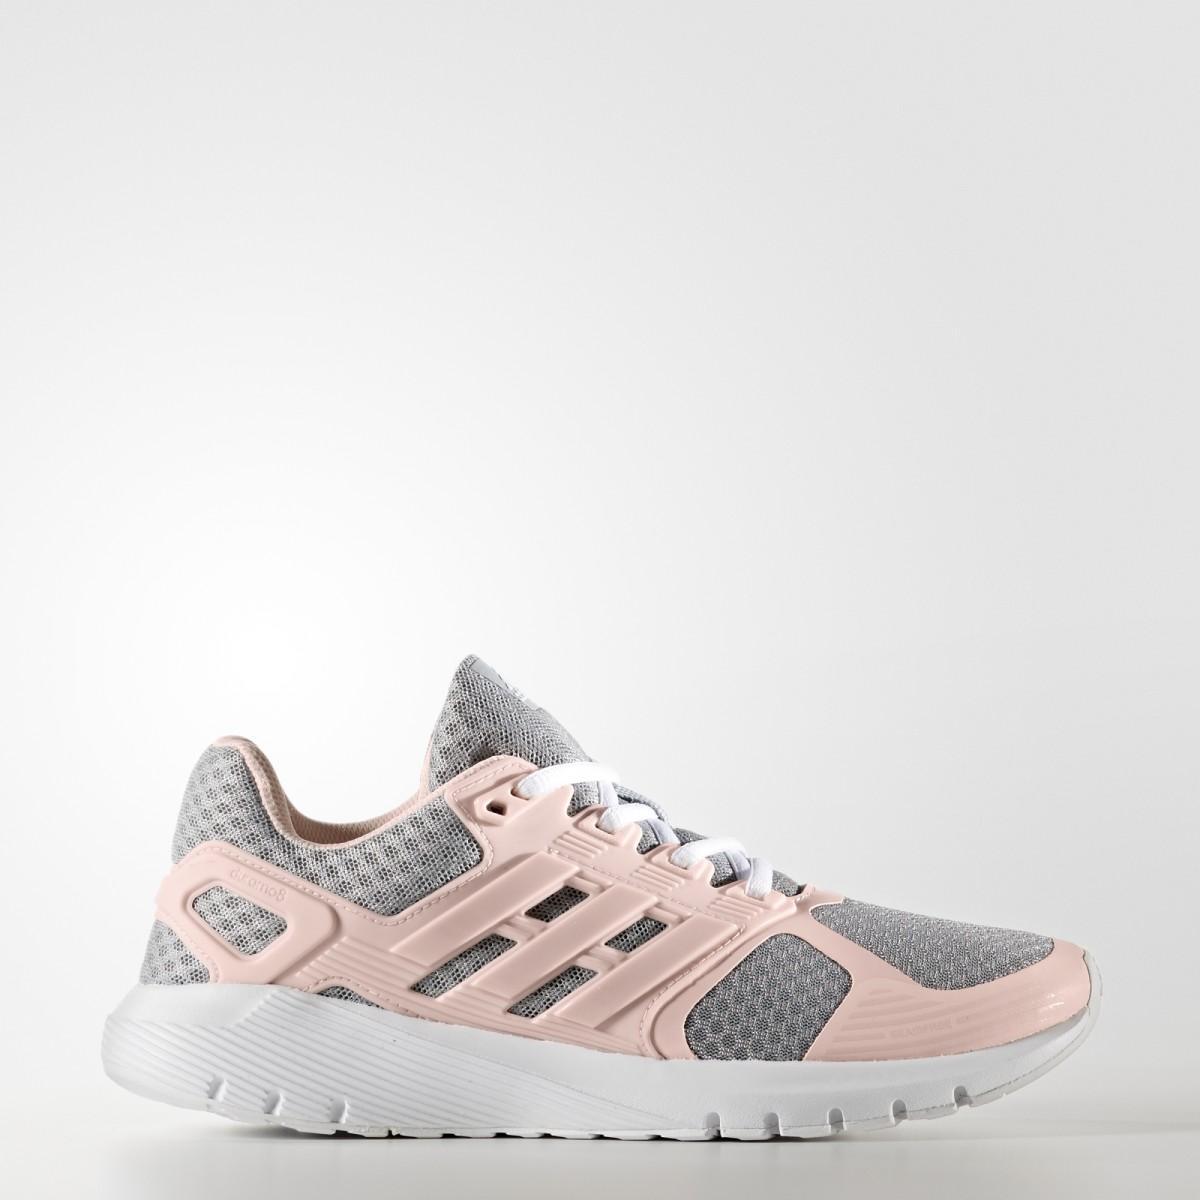 Adidas Sepatu Running Adineo Cloudfoam Speed Aw4911 Hitam Daftar Casual Aq1535 Duramo 8 W Ba8090